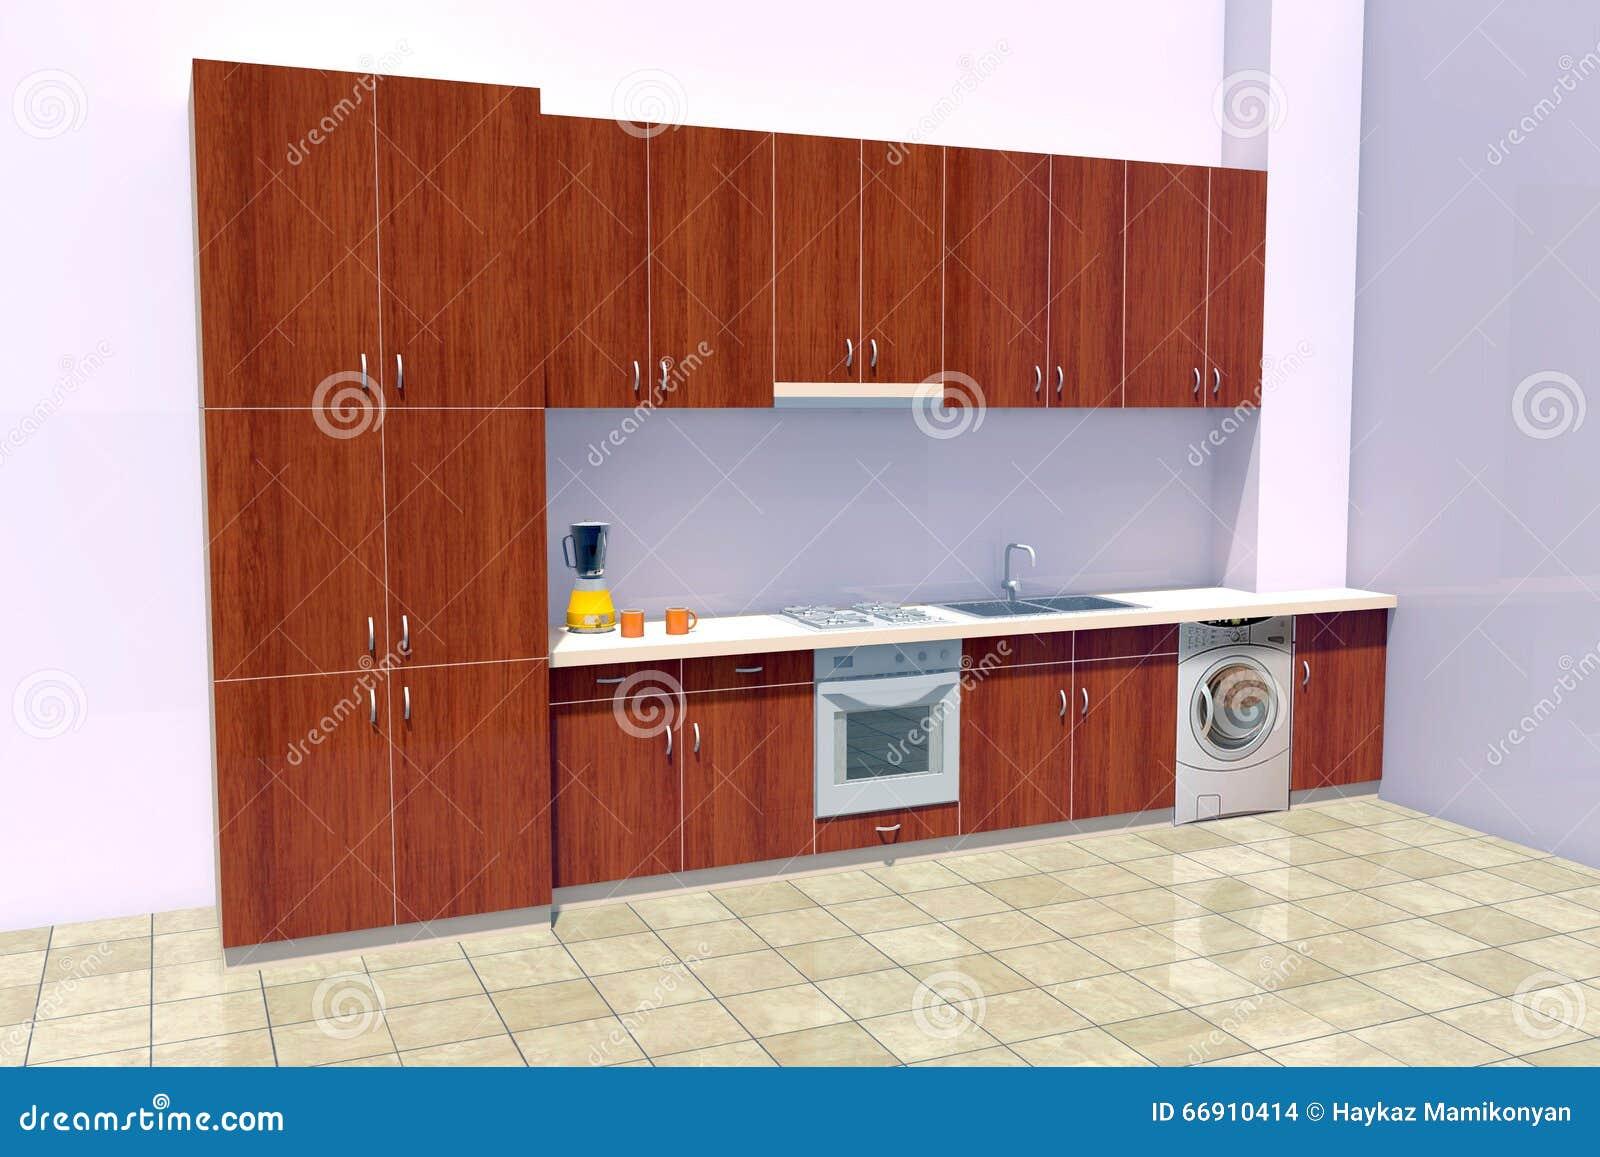 Kitchen Design Stock Illustration Image 66910414